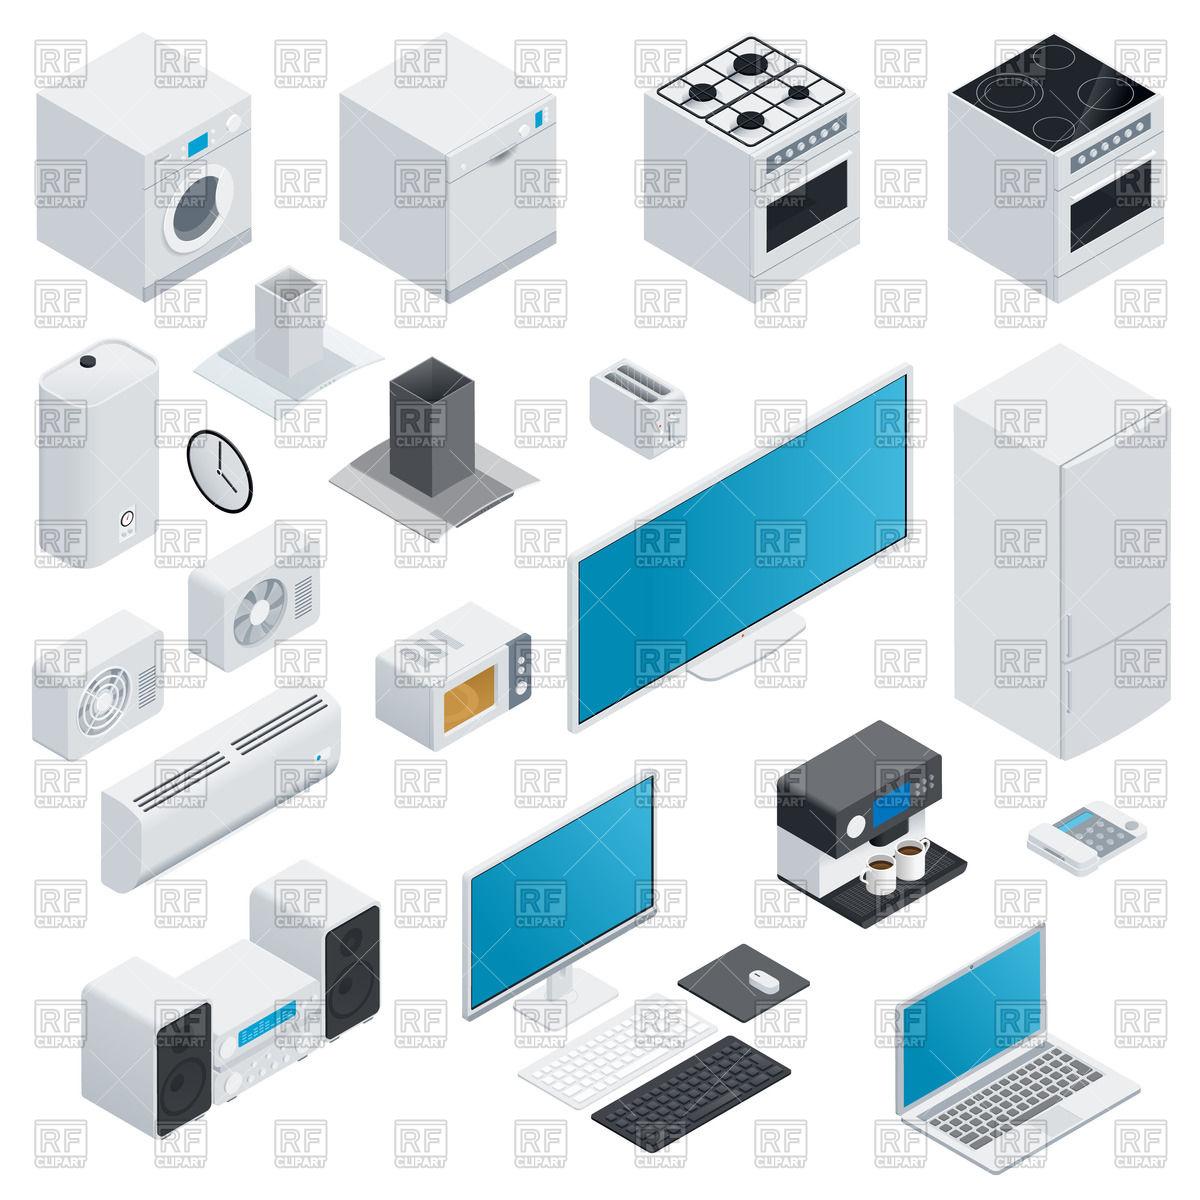 Household appliances isometric icon set Vector Image #72636.